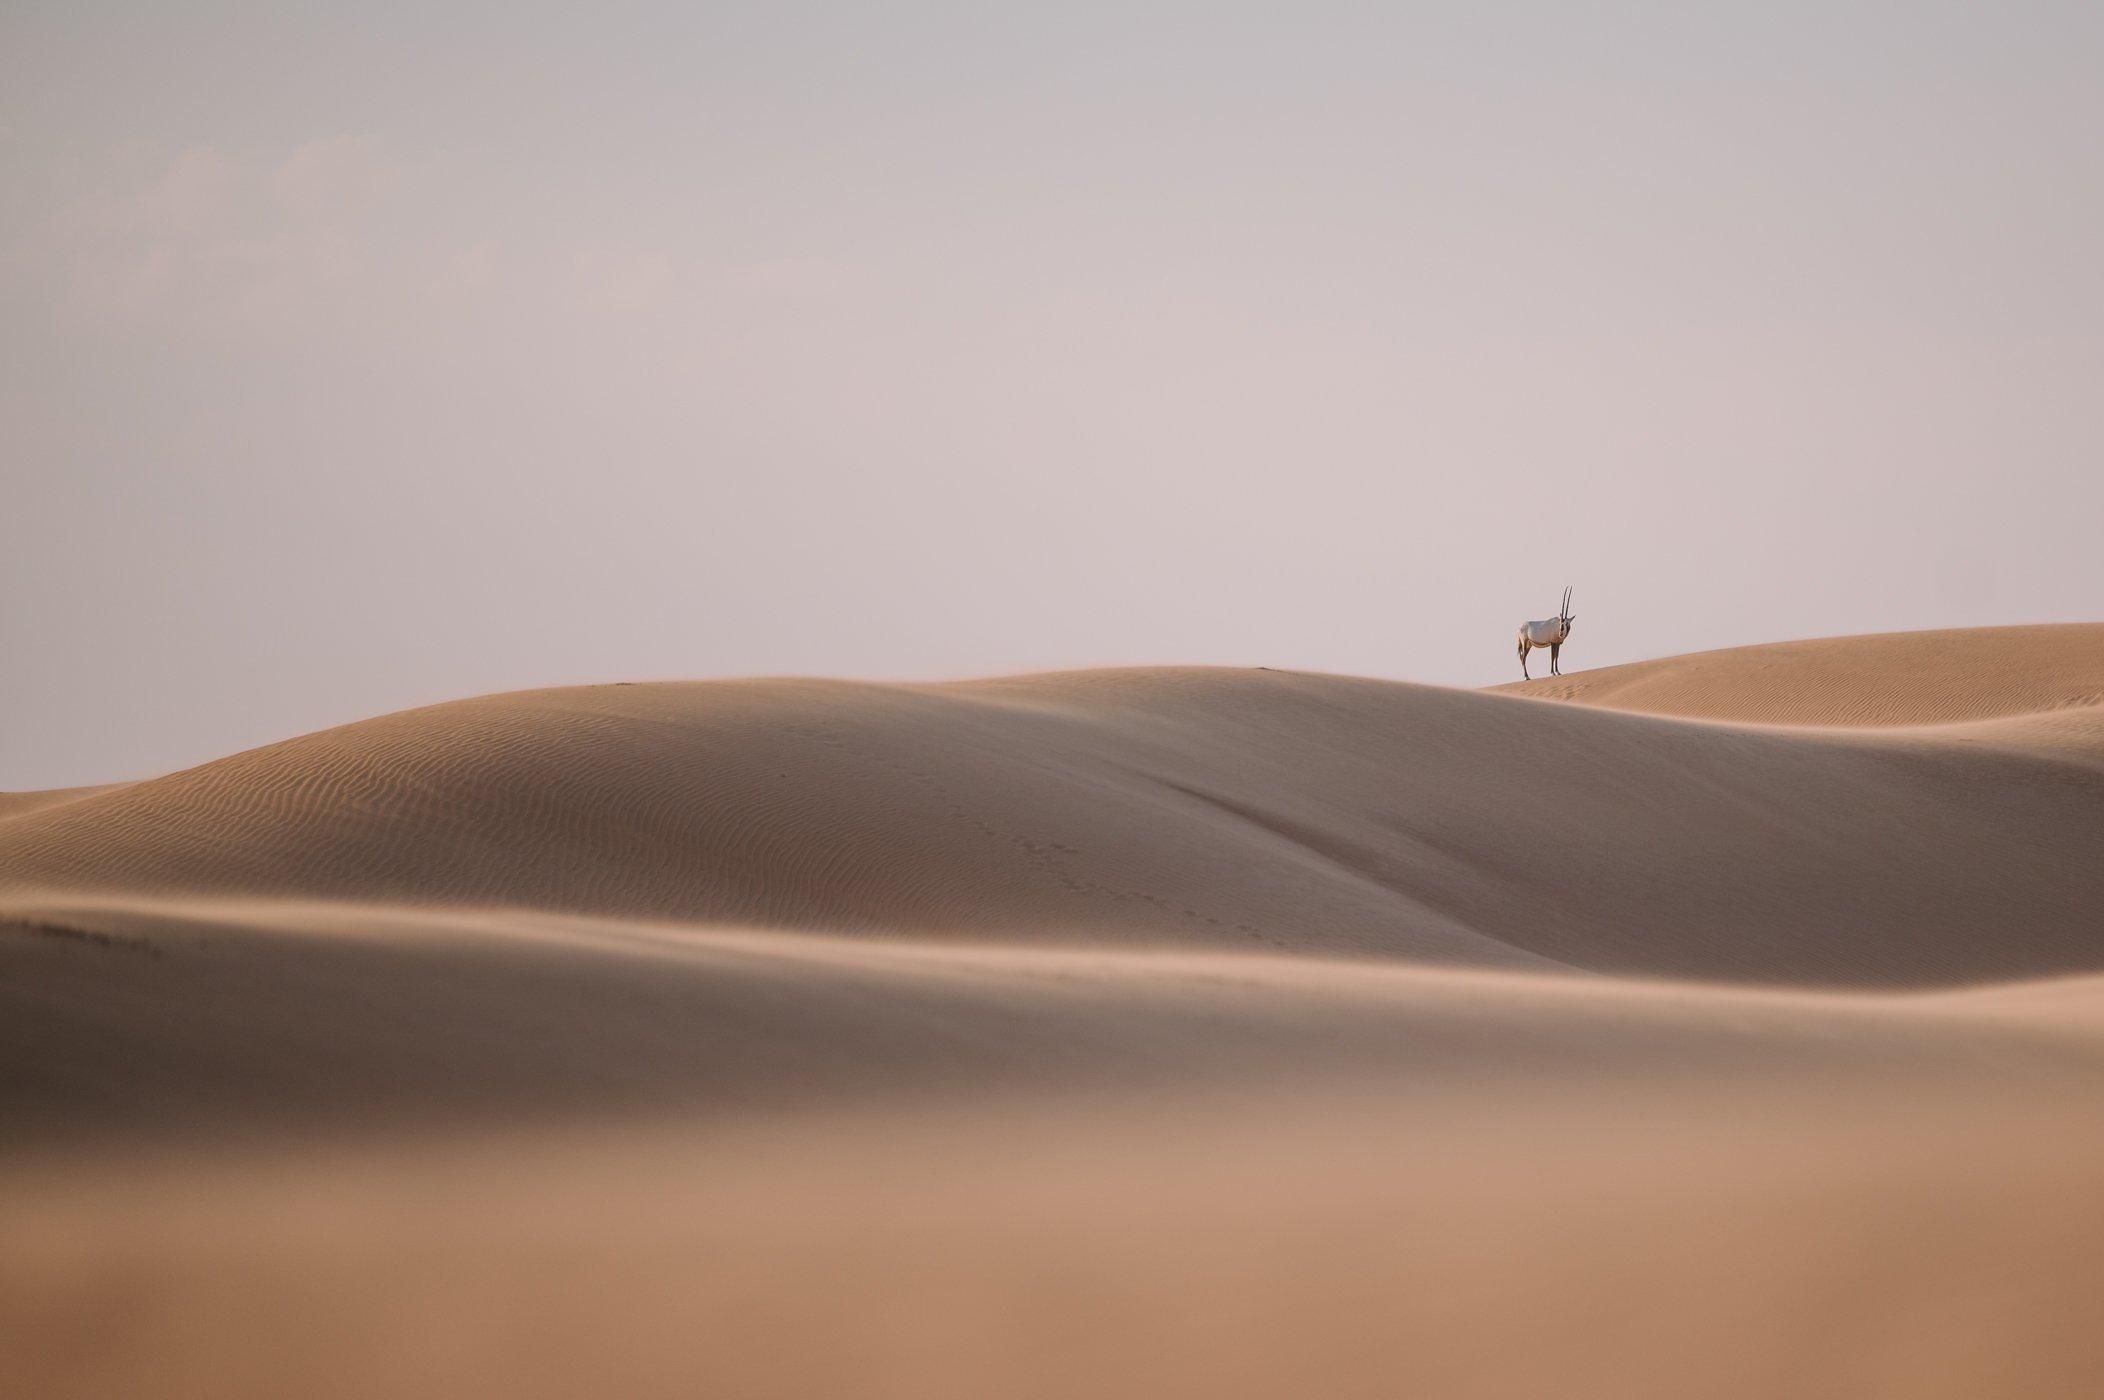 Oryx in the Dubai desert conservation reserve